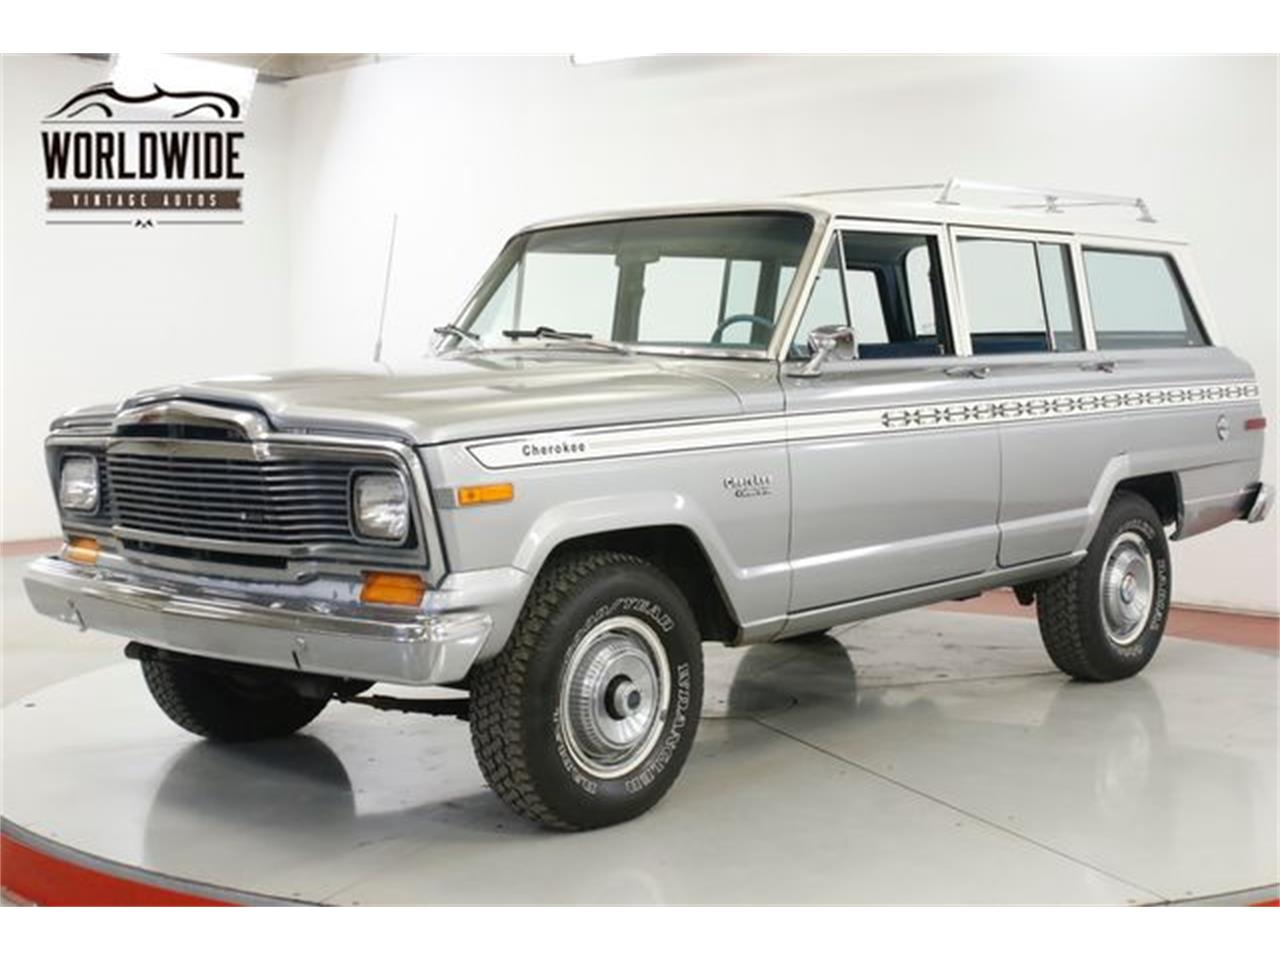 for sale 1979 jeep cherokee in denver , colorado cars - denver, co at geebo